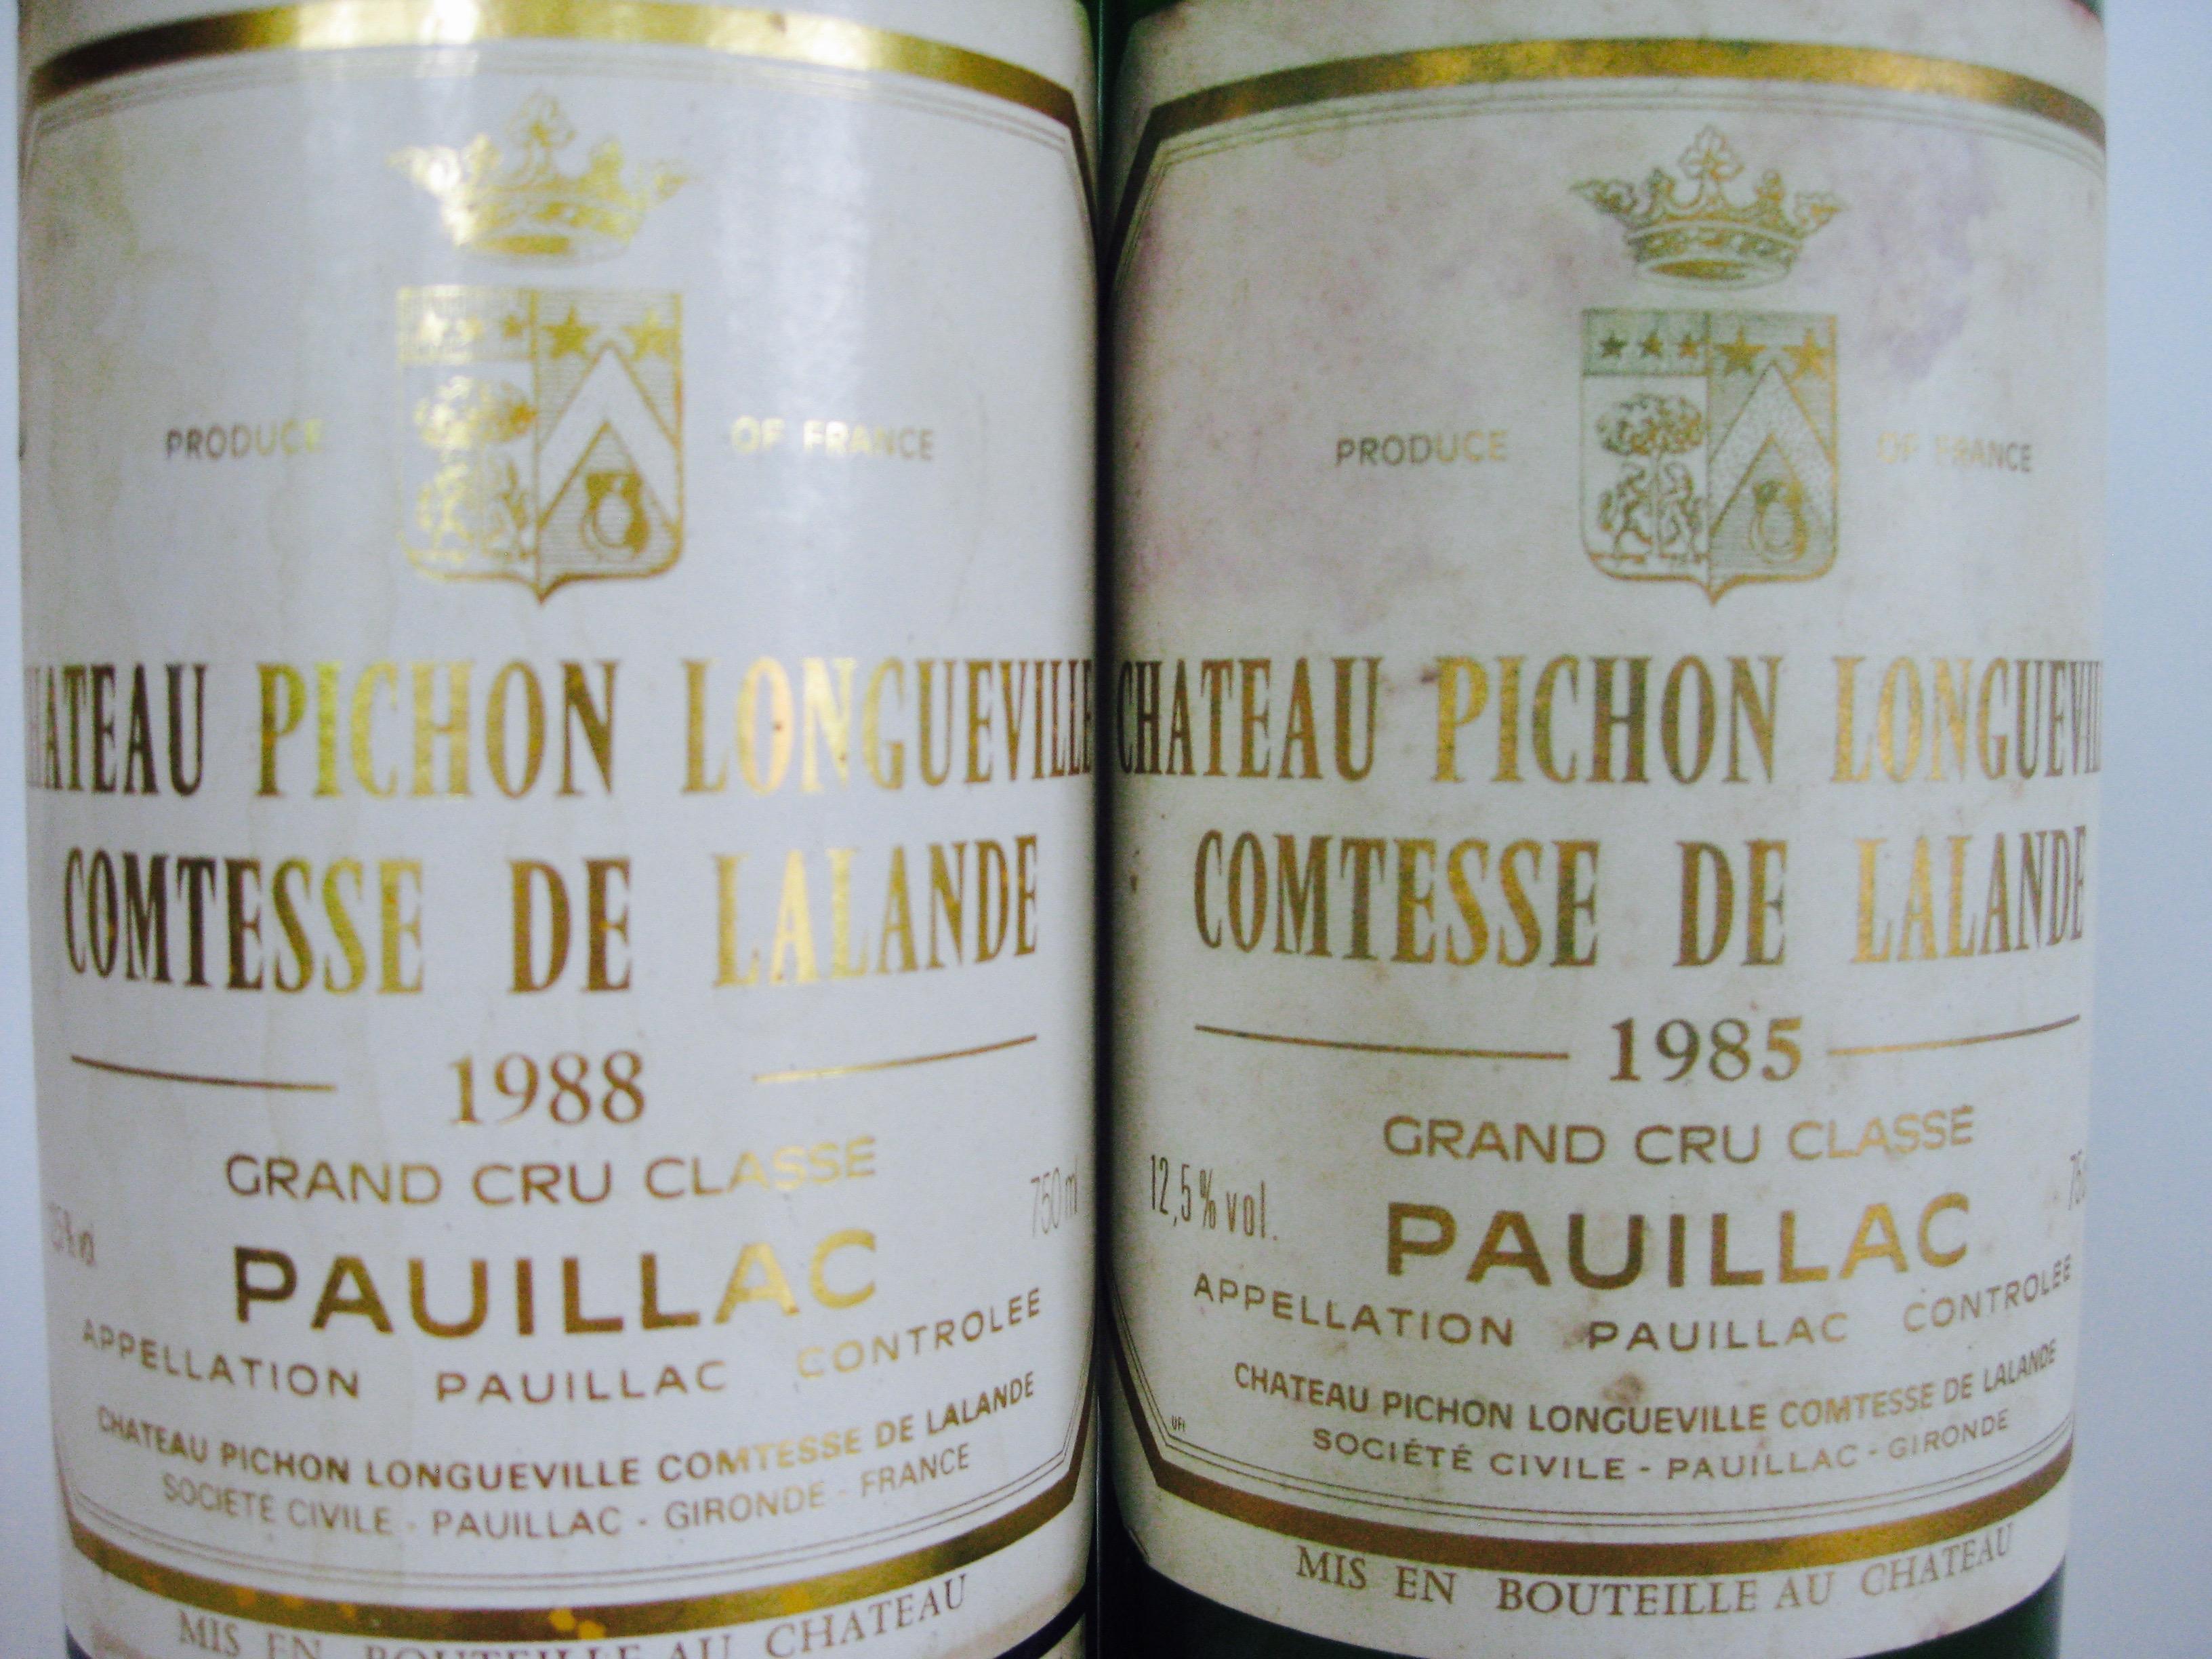 1988 & 1985 Chateau Pichon Lalande | John Mahoney Drinks Wine